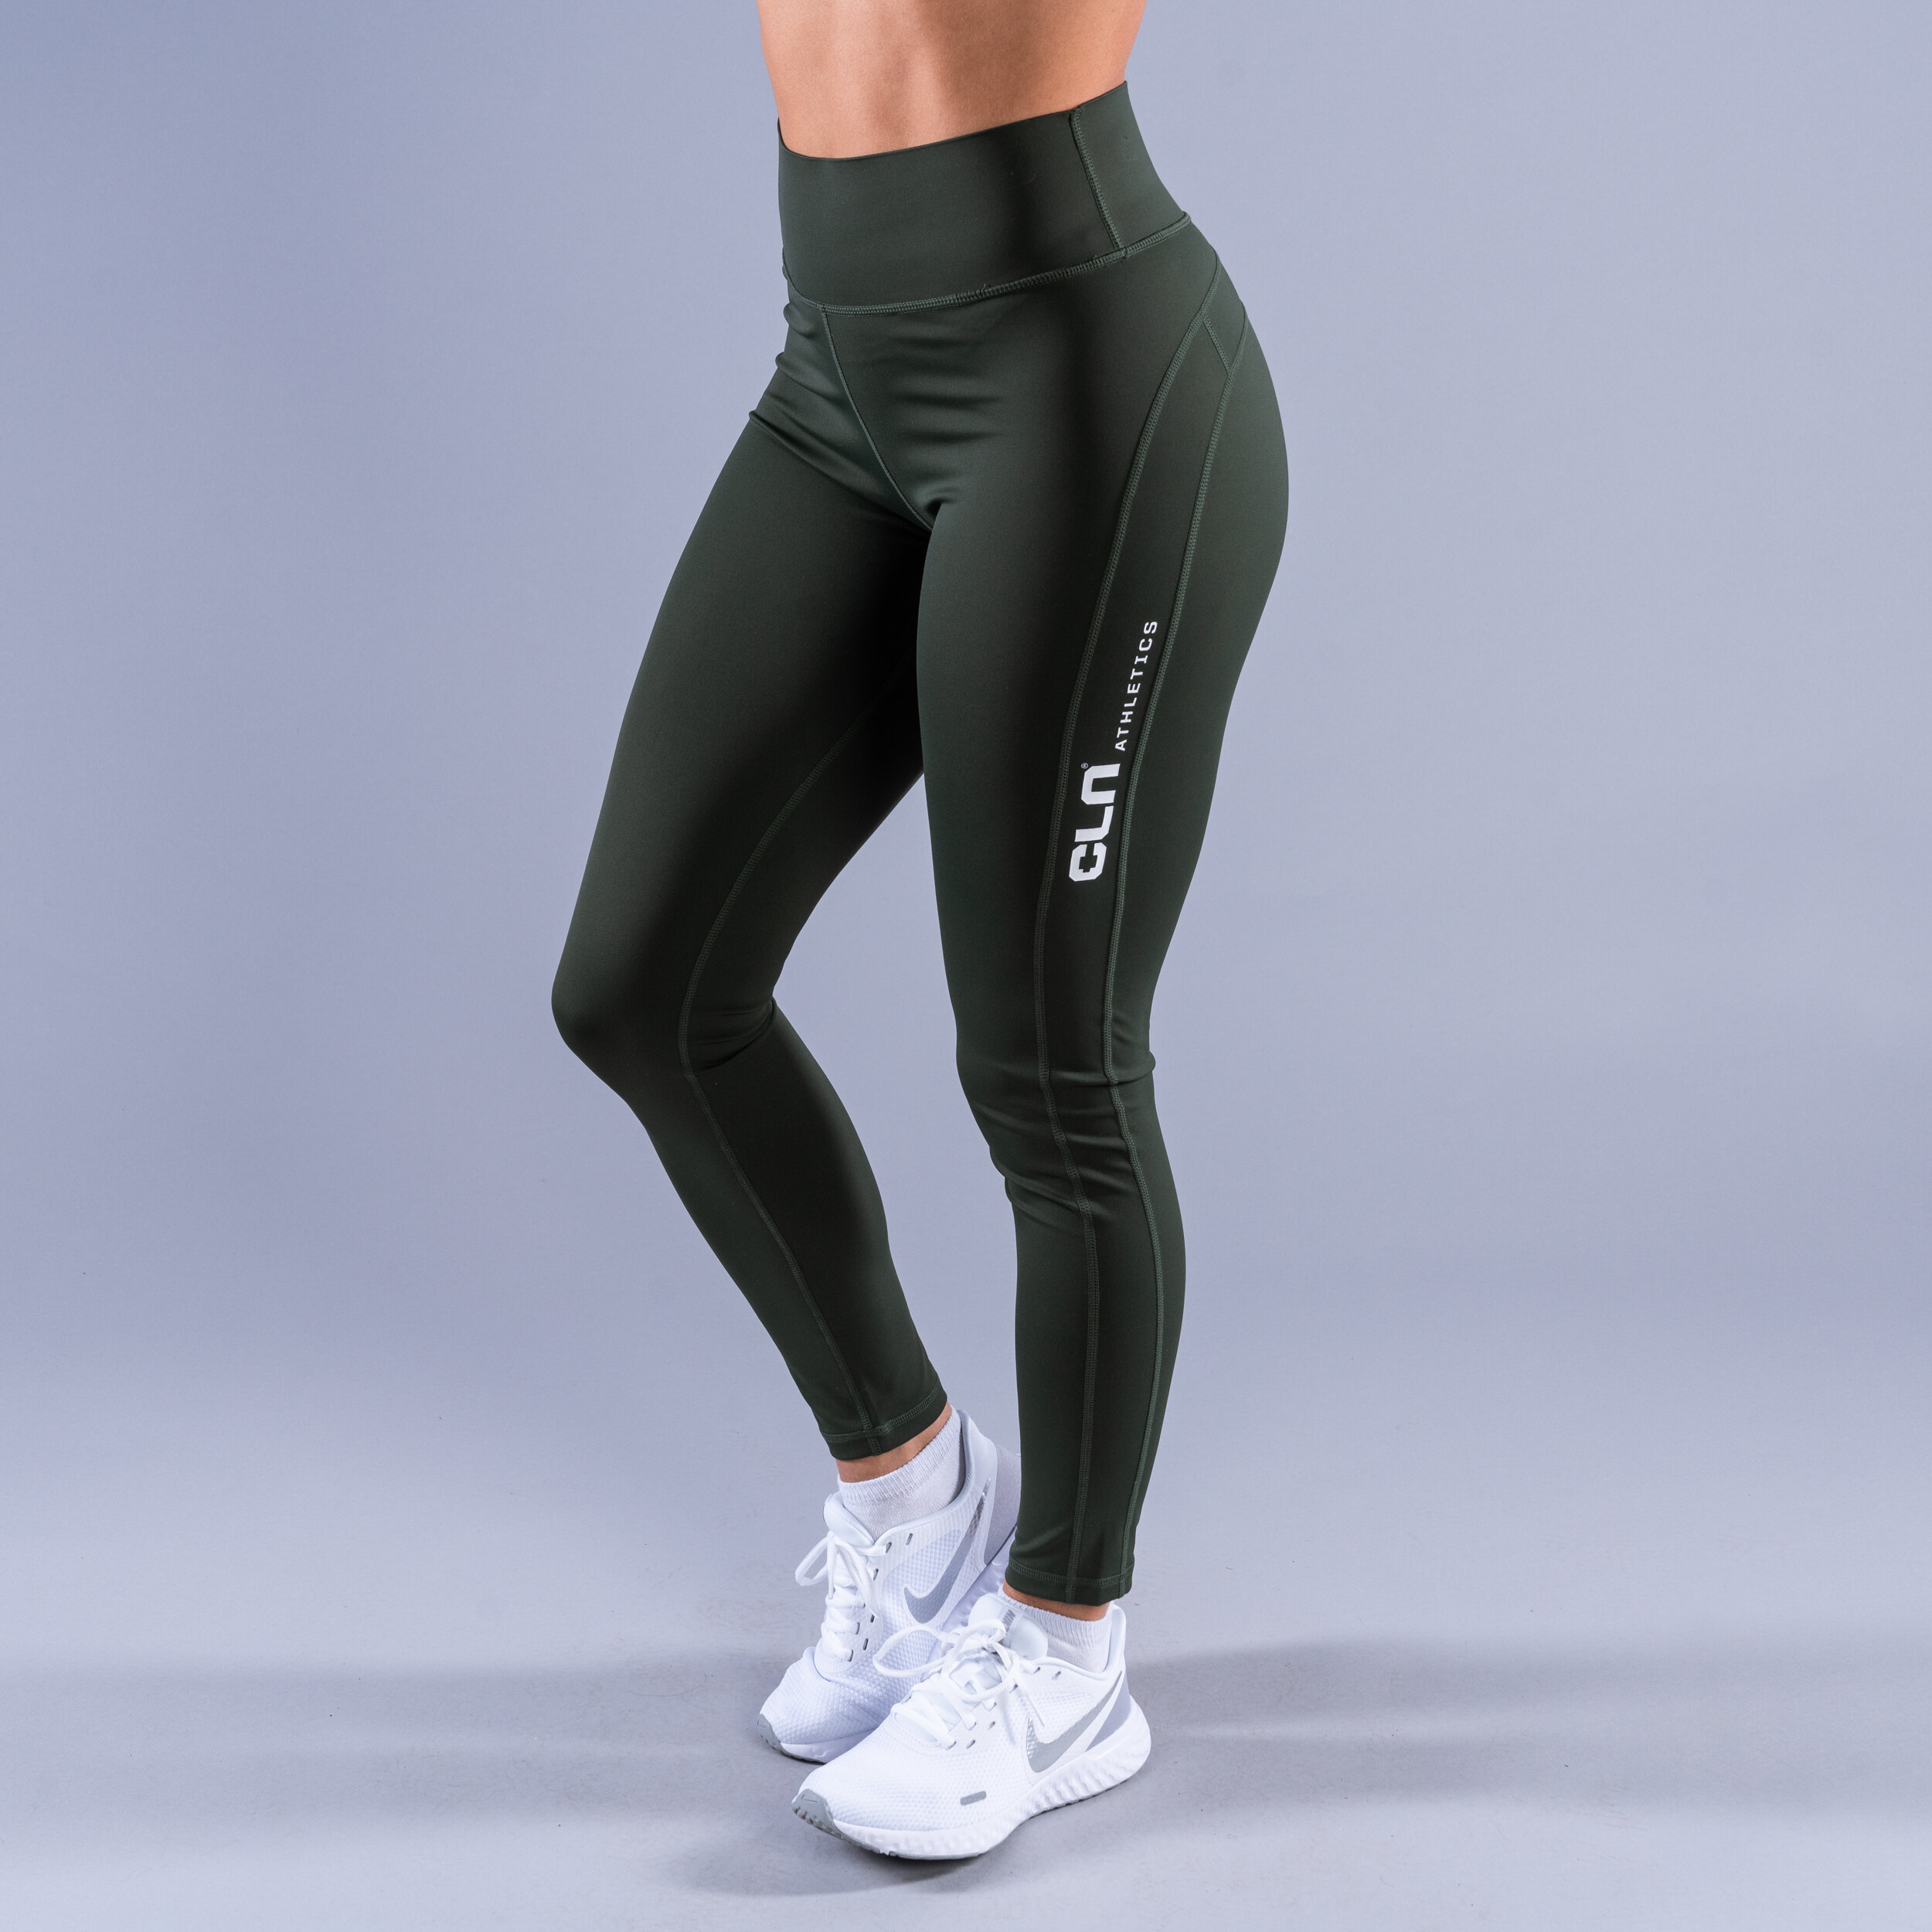 Omni tights - Intense sport bra Package Green